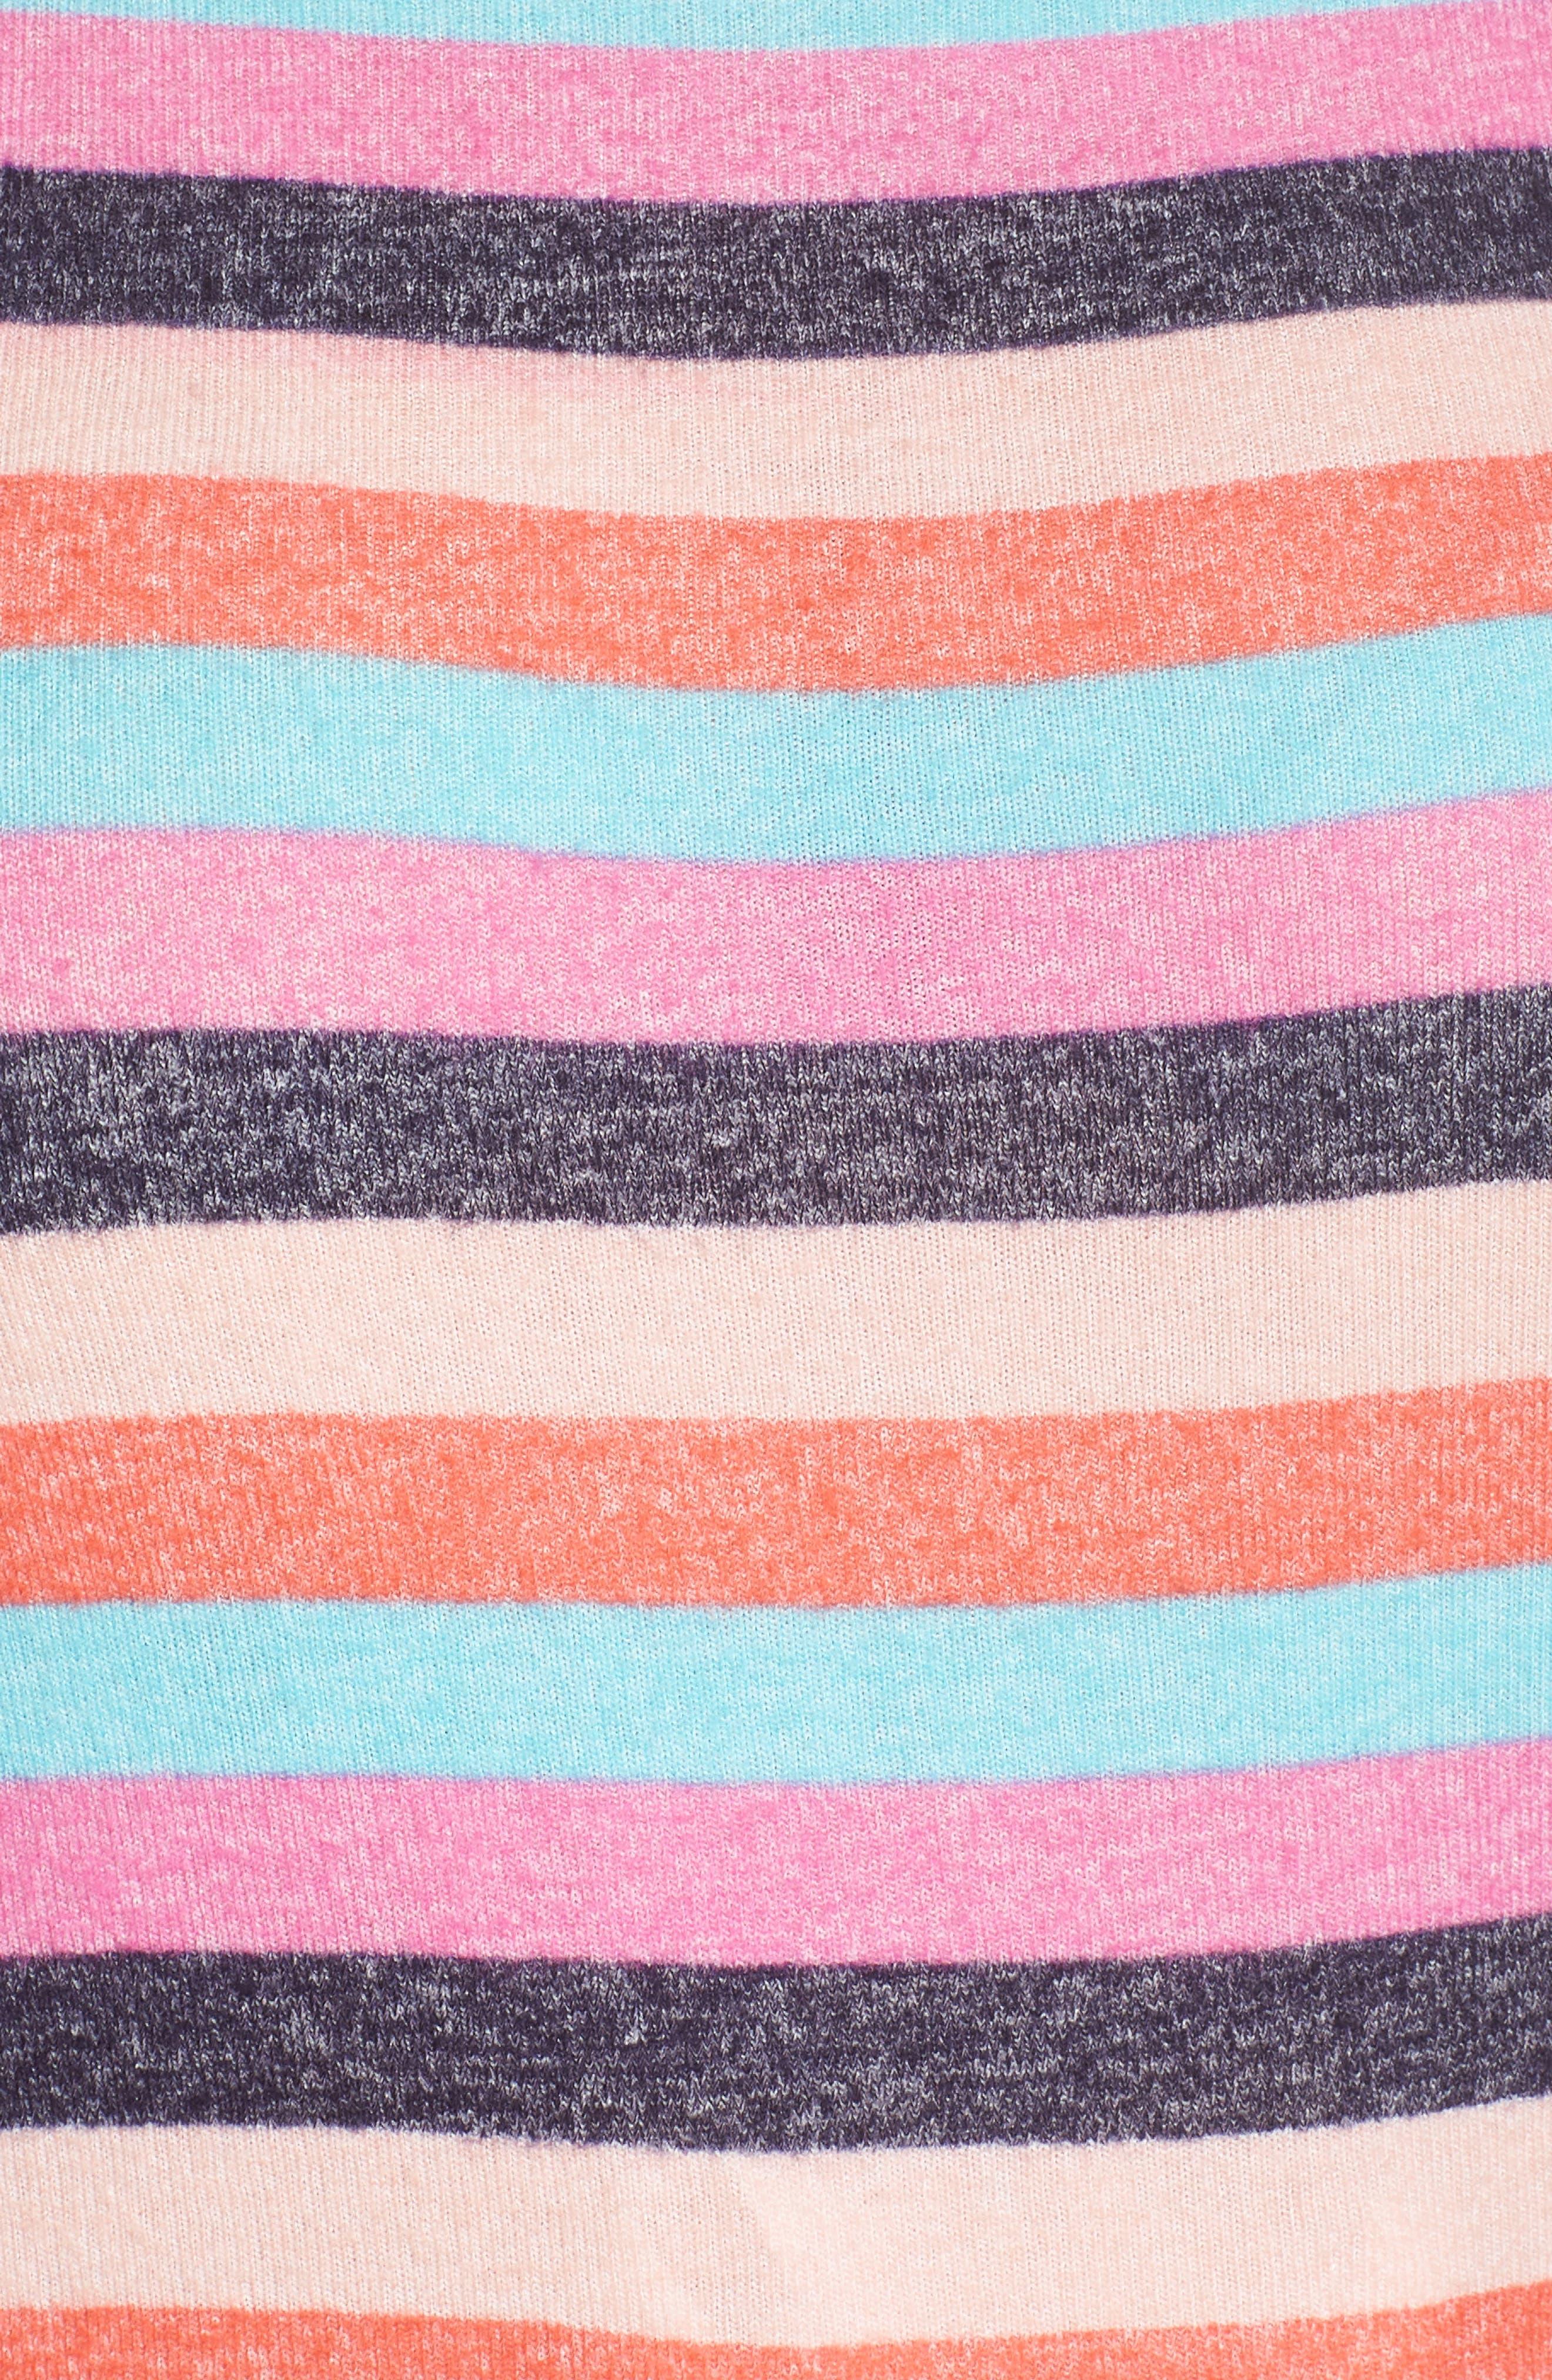 Cozy Crew Lounge Sweater,                             Alternate thumbnail 5, color,                             Navy Dusk Milli Multi Stripe